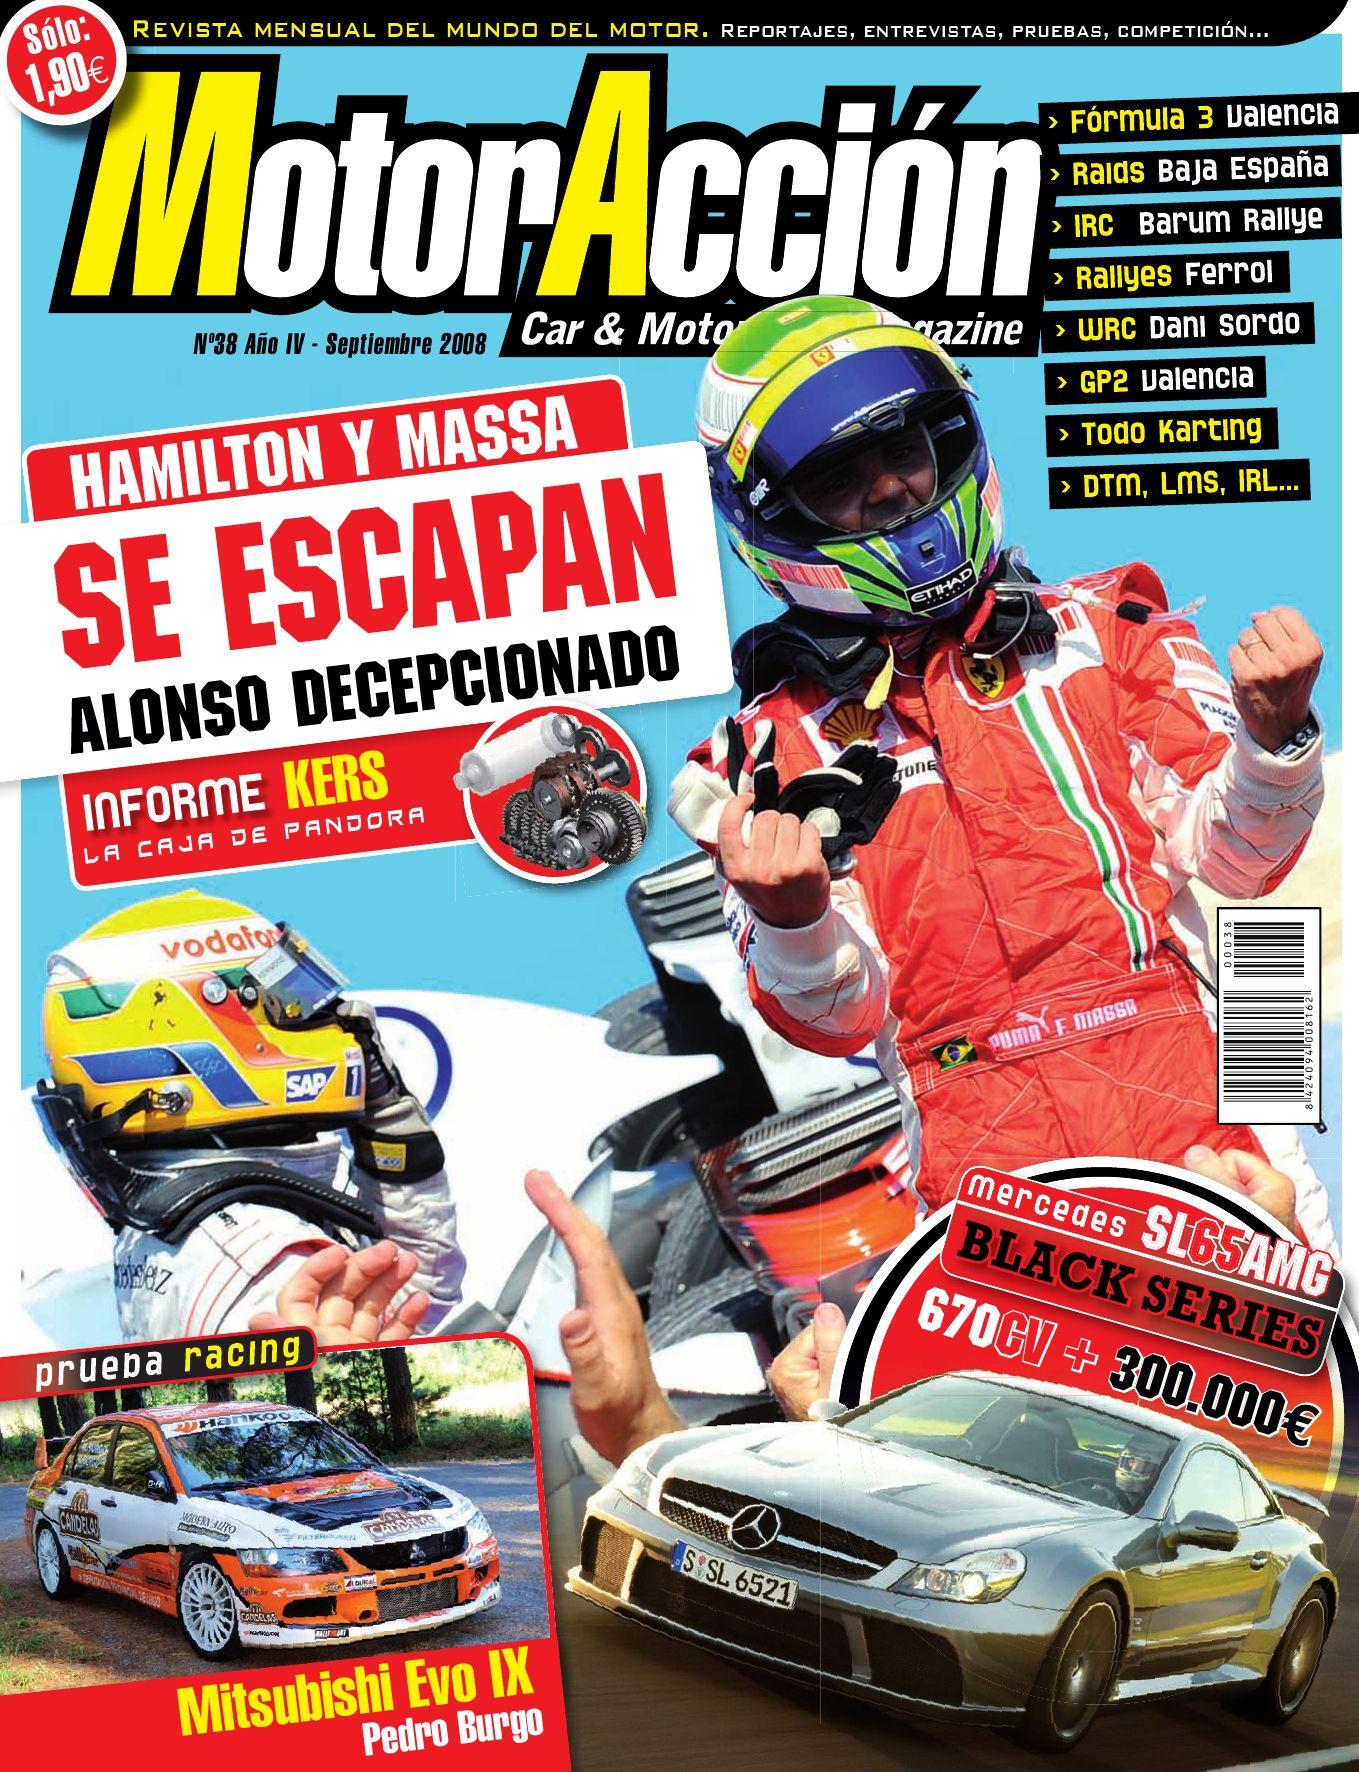 MotorAccion 19 by Motoraccion Revista mensual - issuu